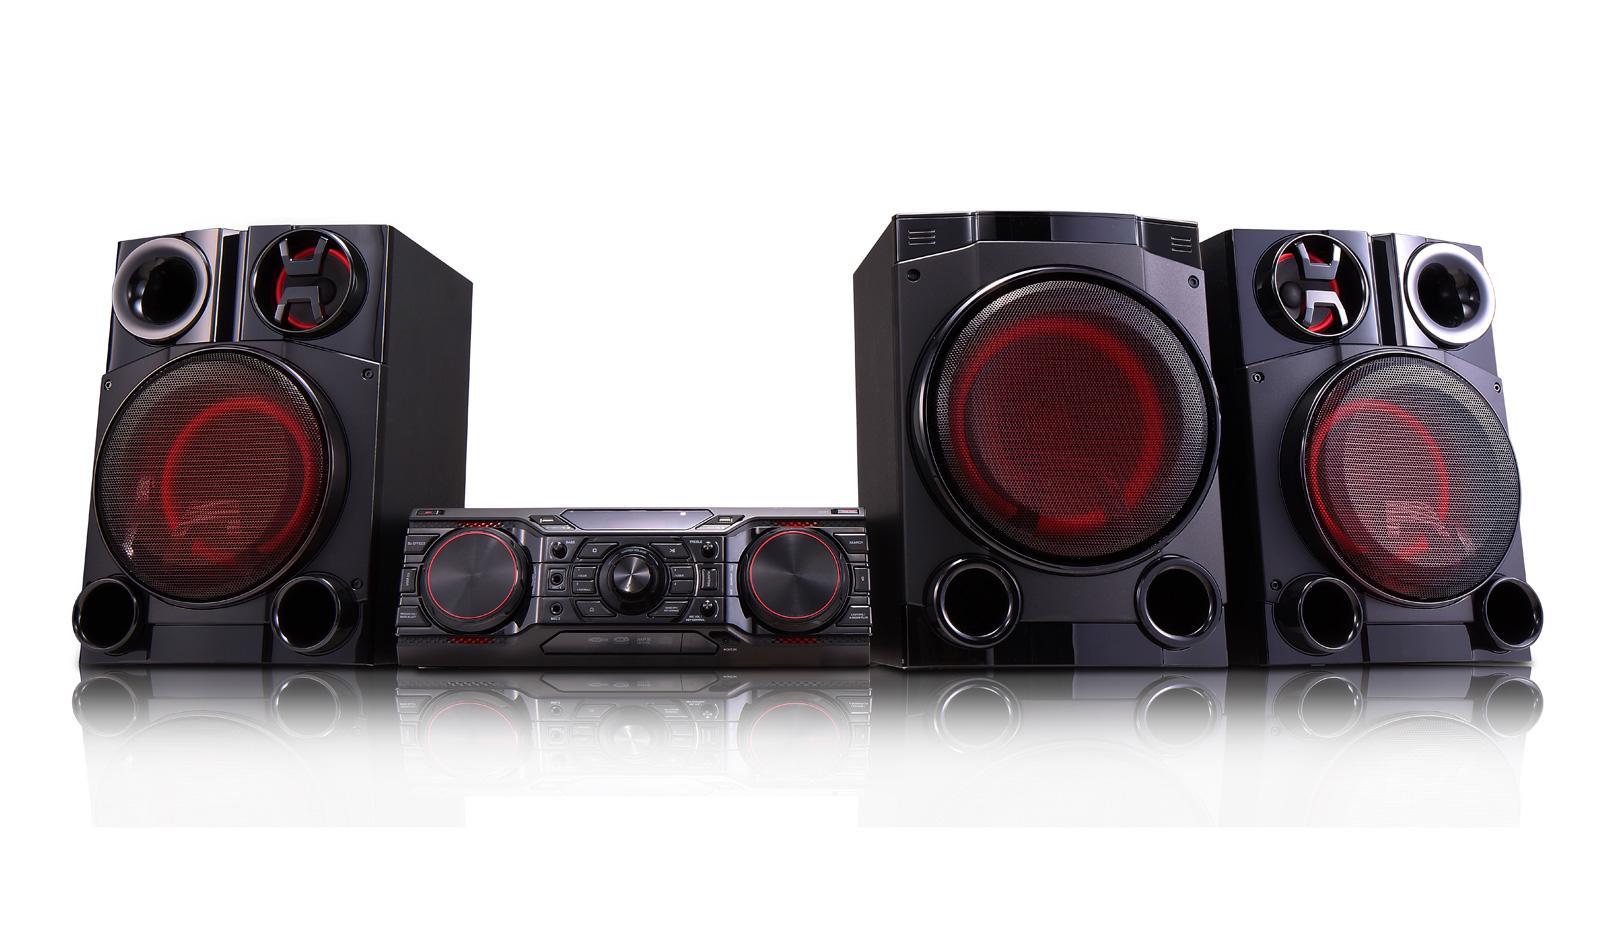 LG CM8460: LG XBOOM 2750W Hi-Fi Entertainment System with Bluetooth®  Connectivity | LG USA